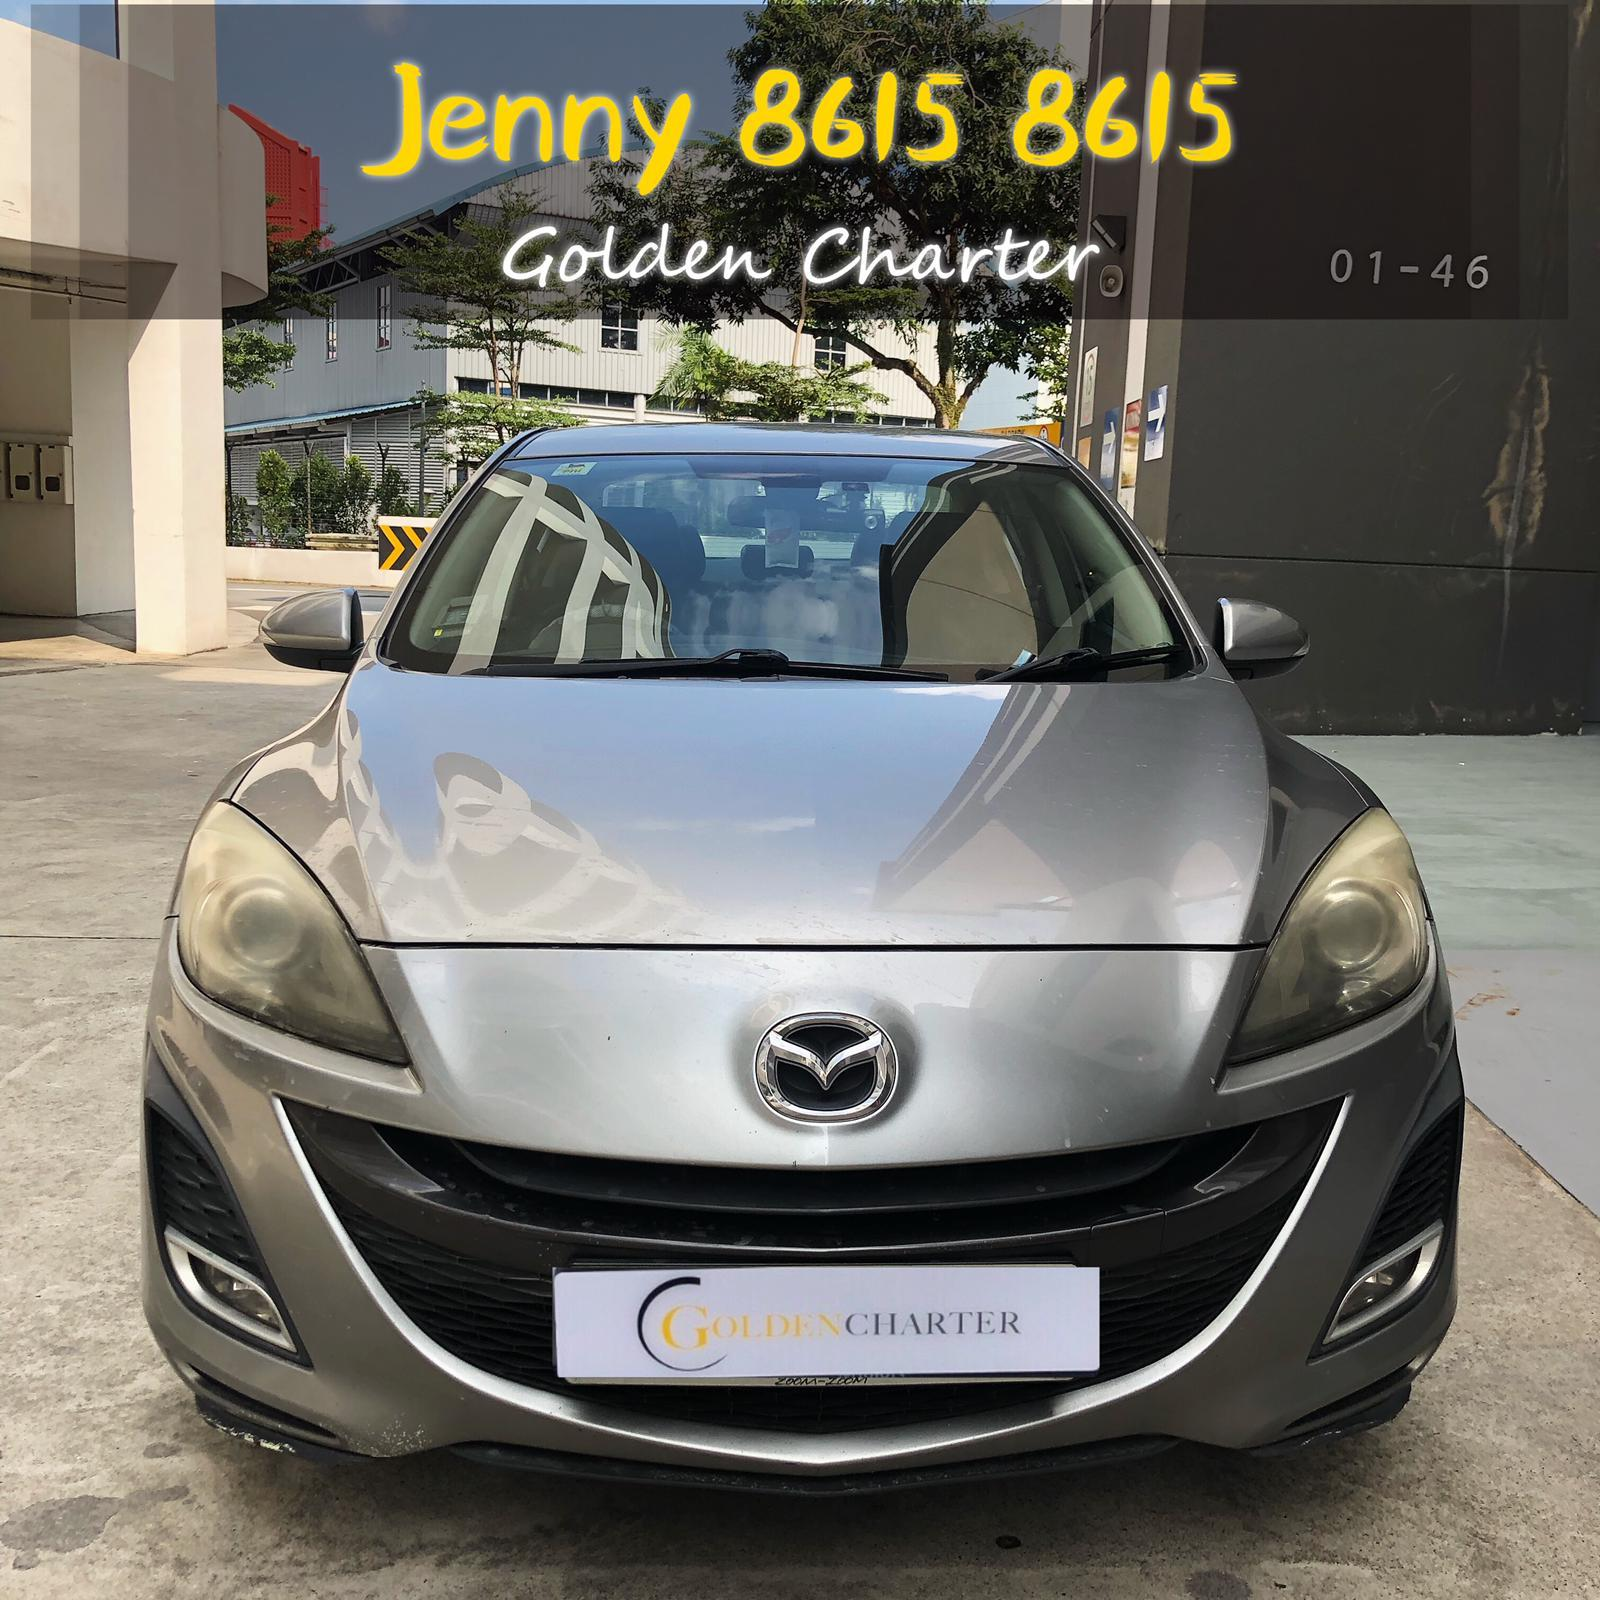 Mazda 3 1.6a  Car Axio Premio Allion Camry Honda Jazz Fit Civic Cars Hyundai Avante Grab Rental Gojek Or Personal Use Low price and Cheap